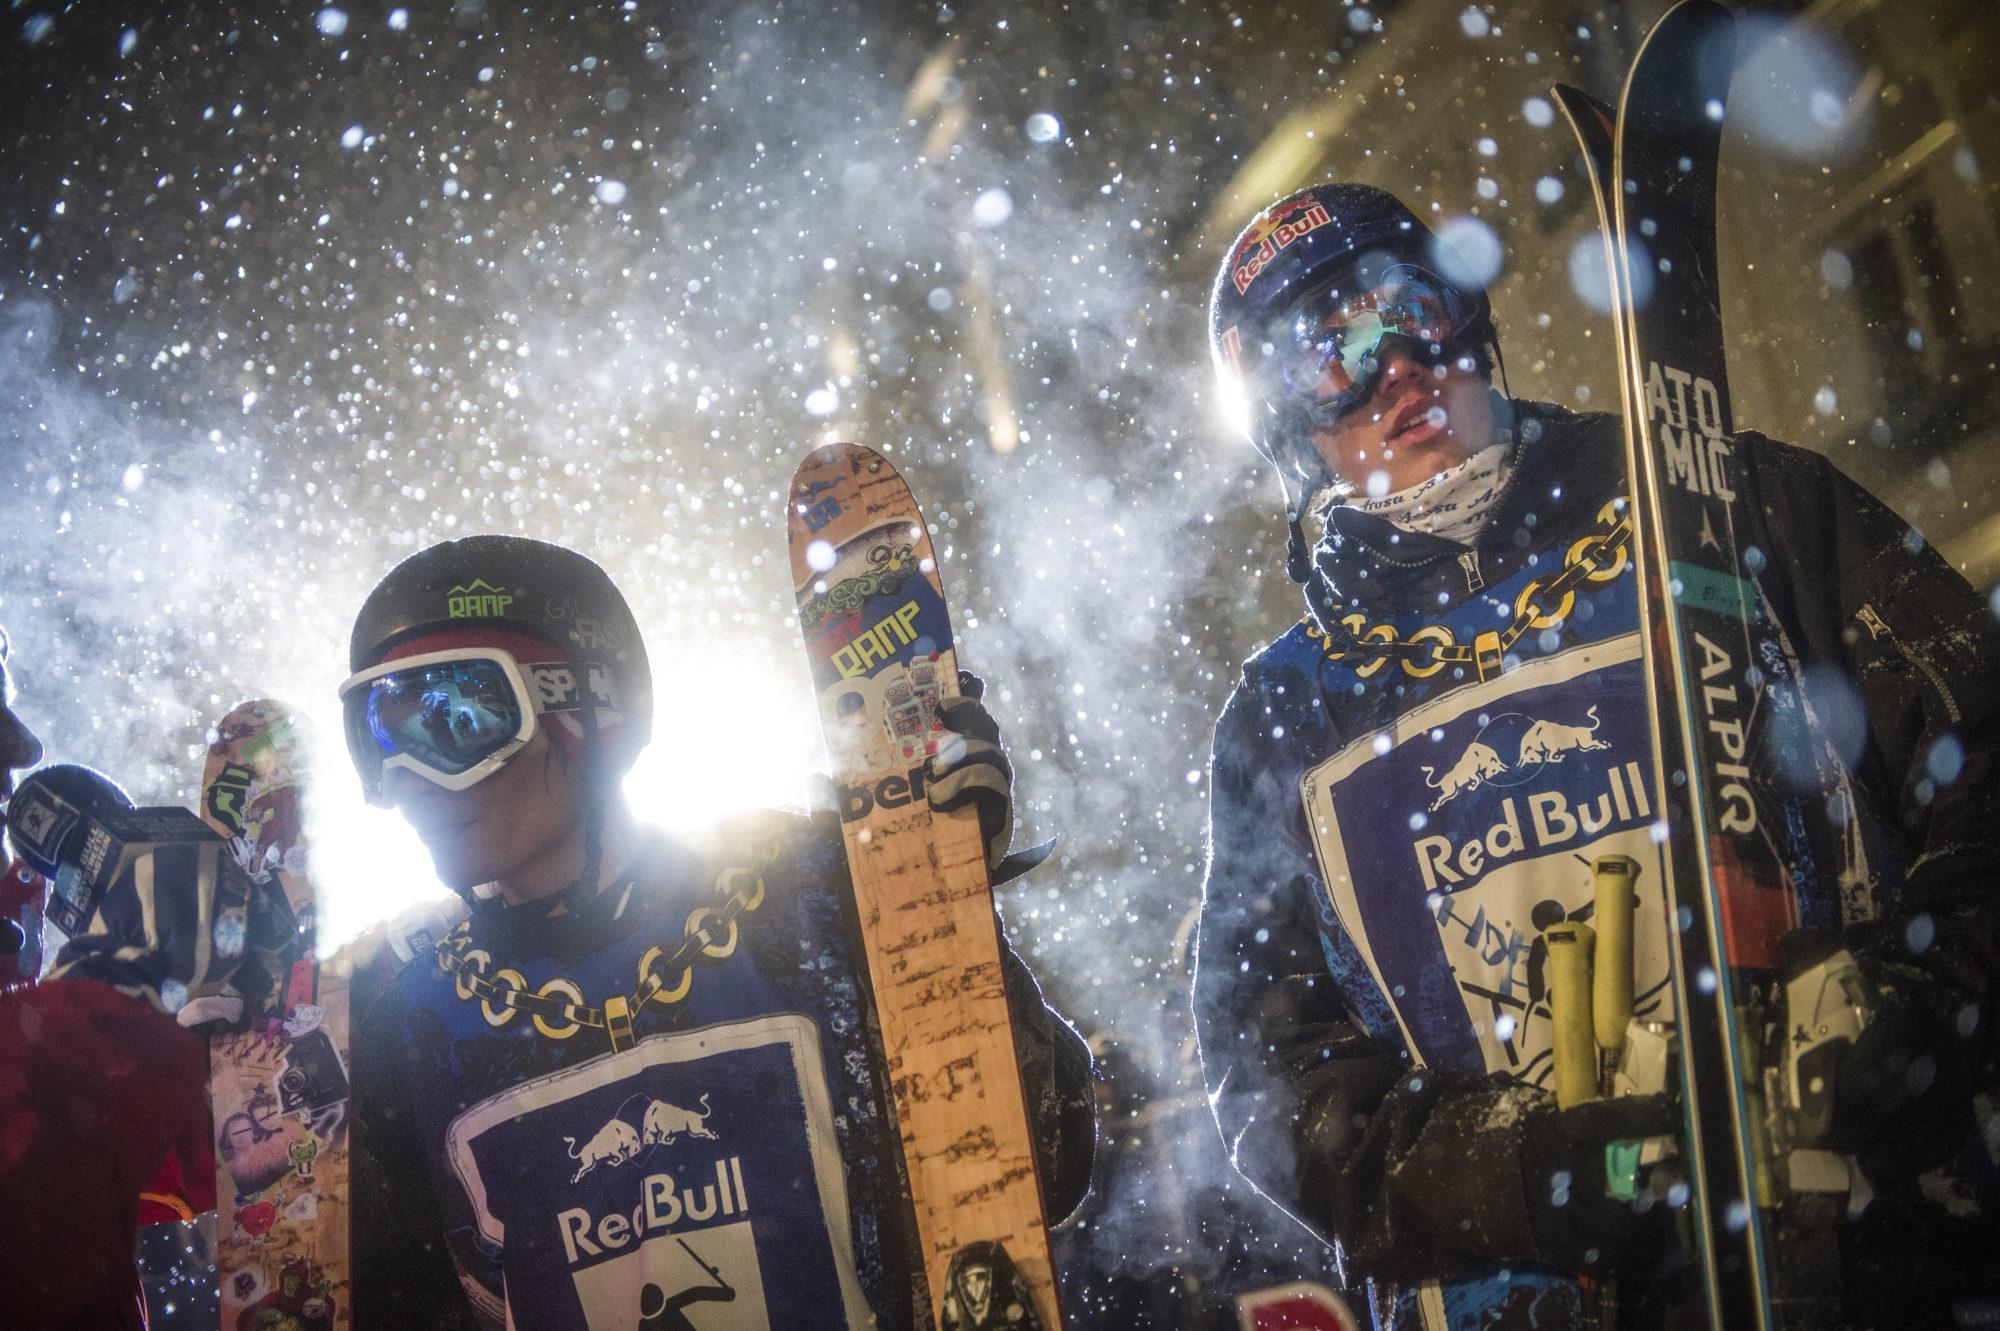 Philip Platzer/Red Bull